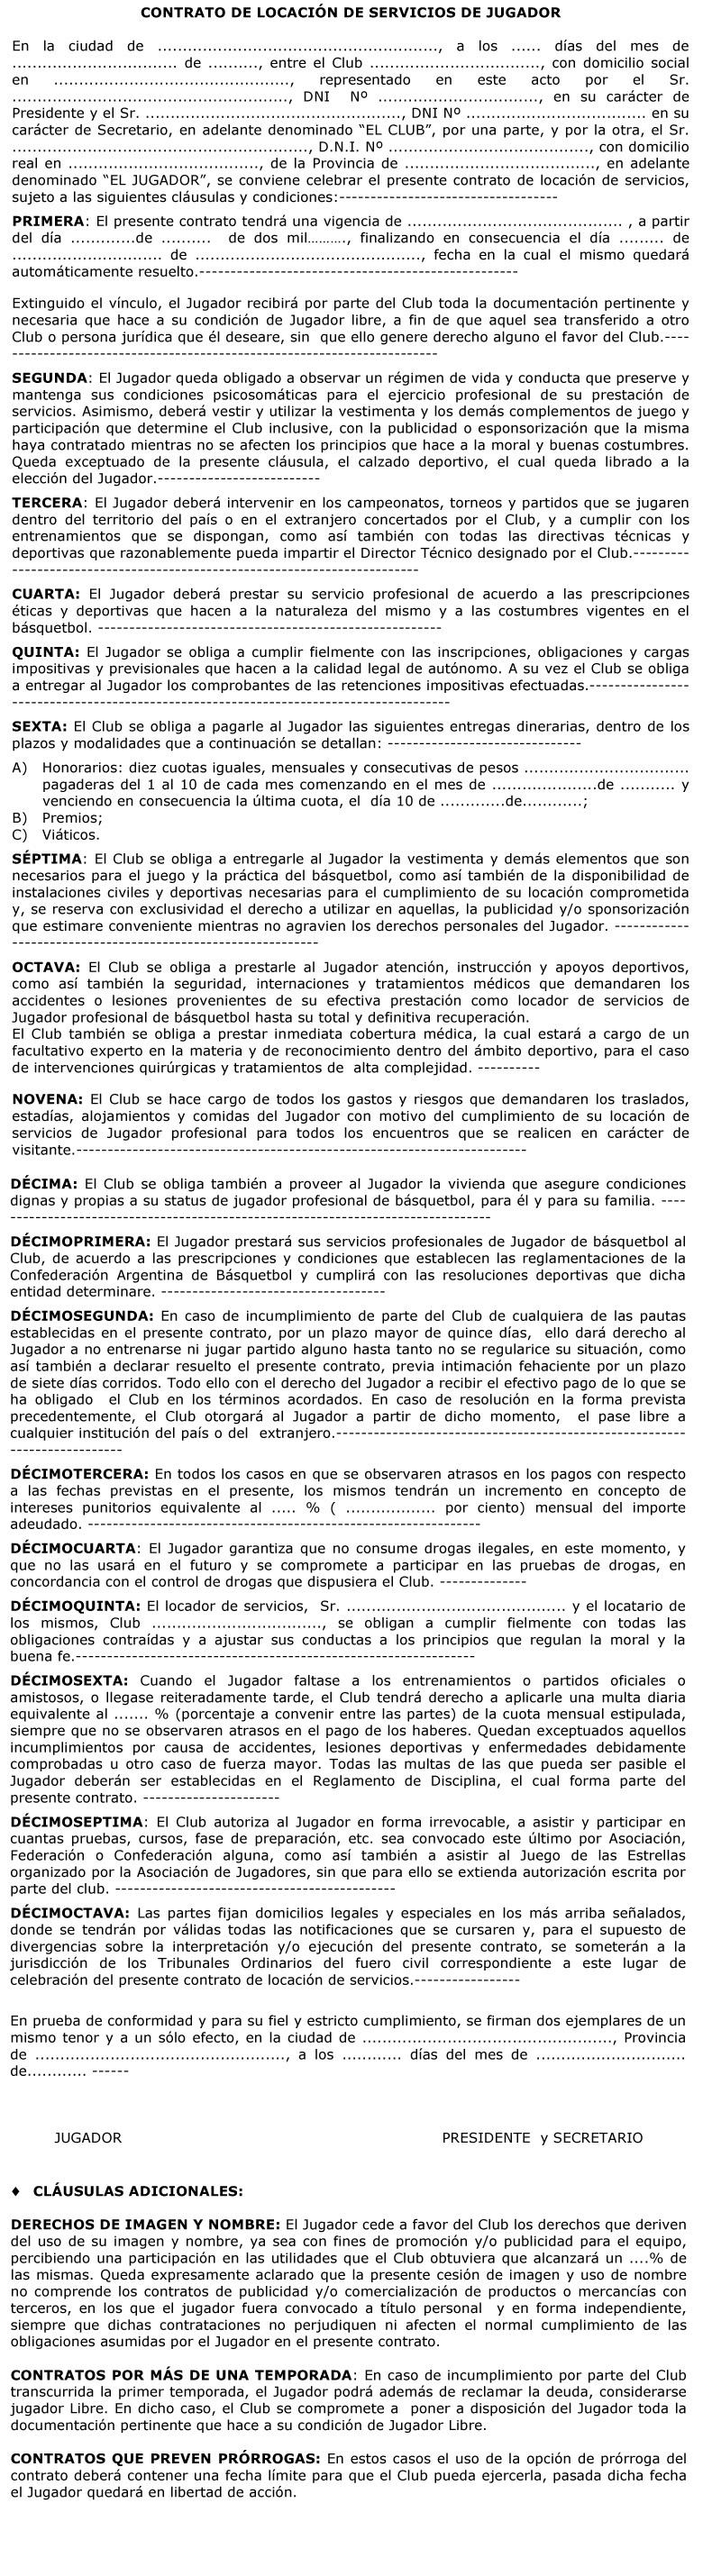 Microsoft Word - Modelo_de_contrato_para_Torneo-Federal.doc